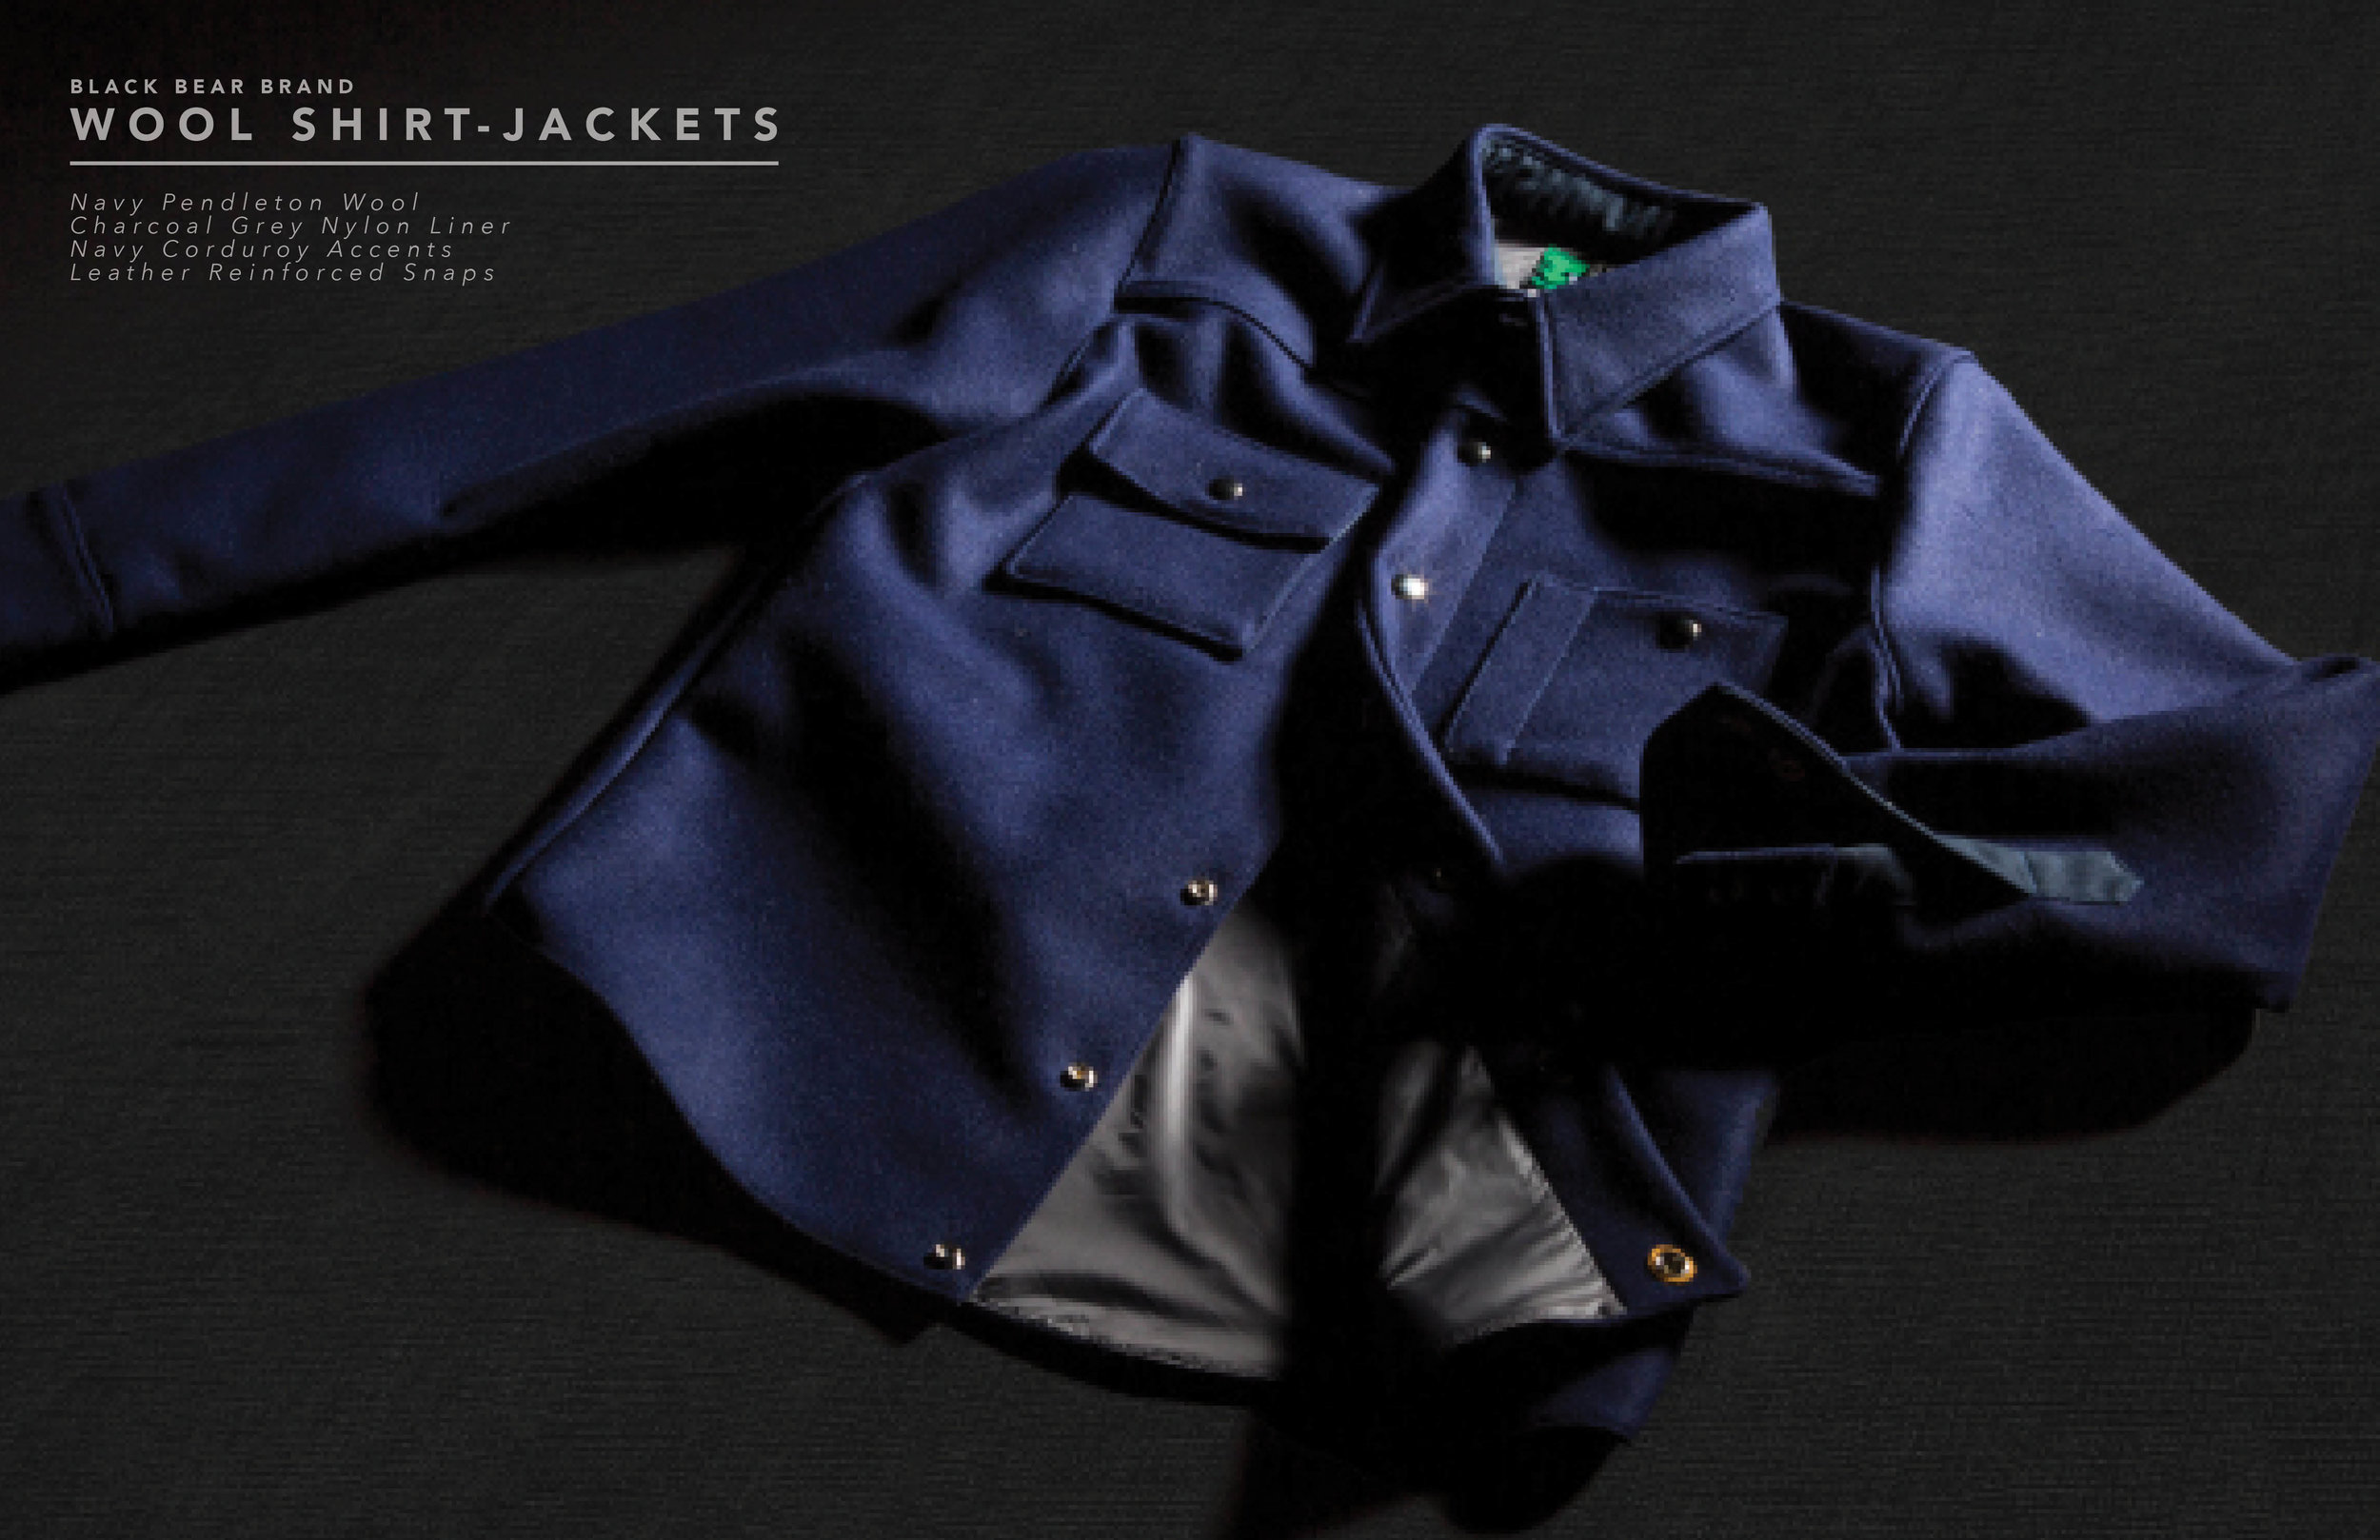 Black Bear Brand Wool Collection